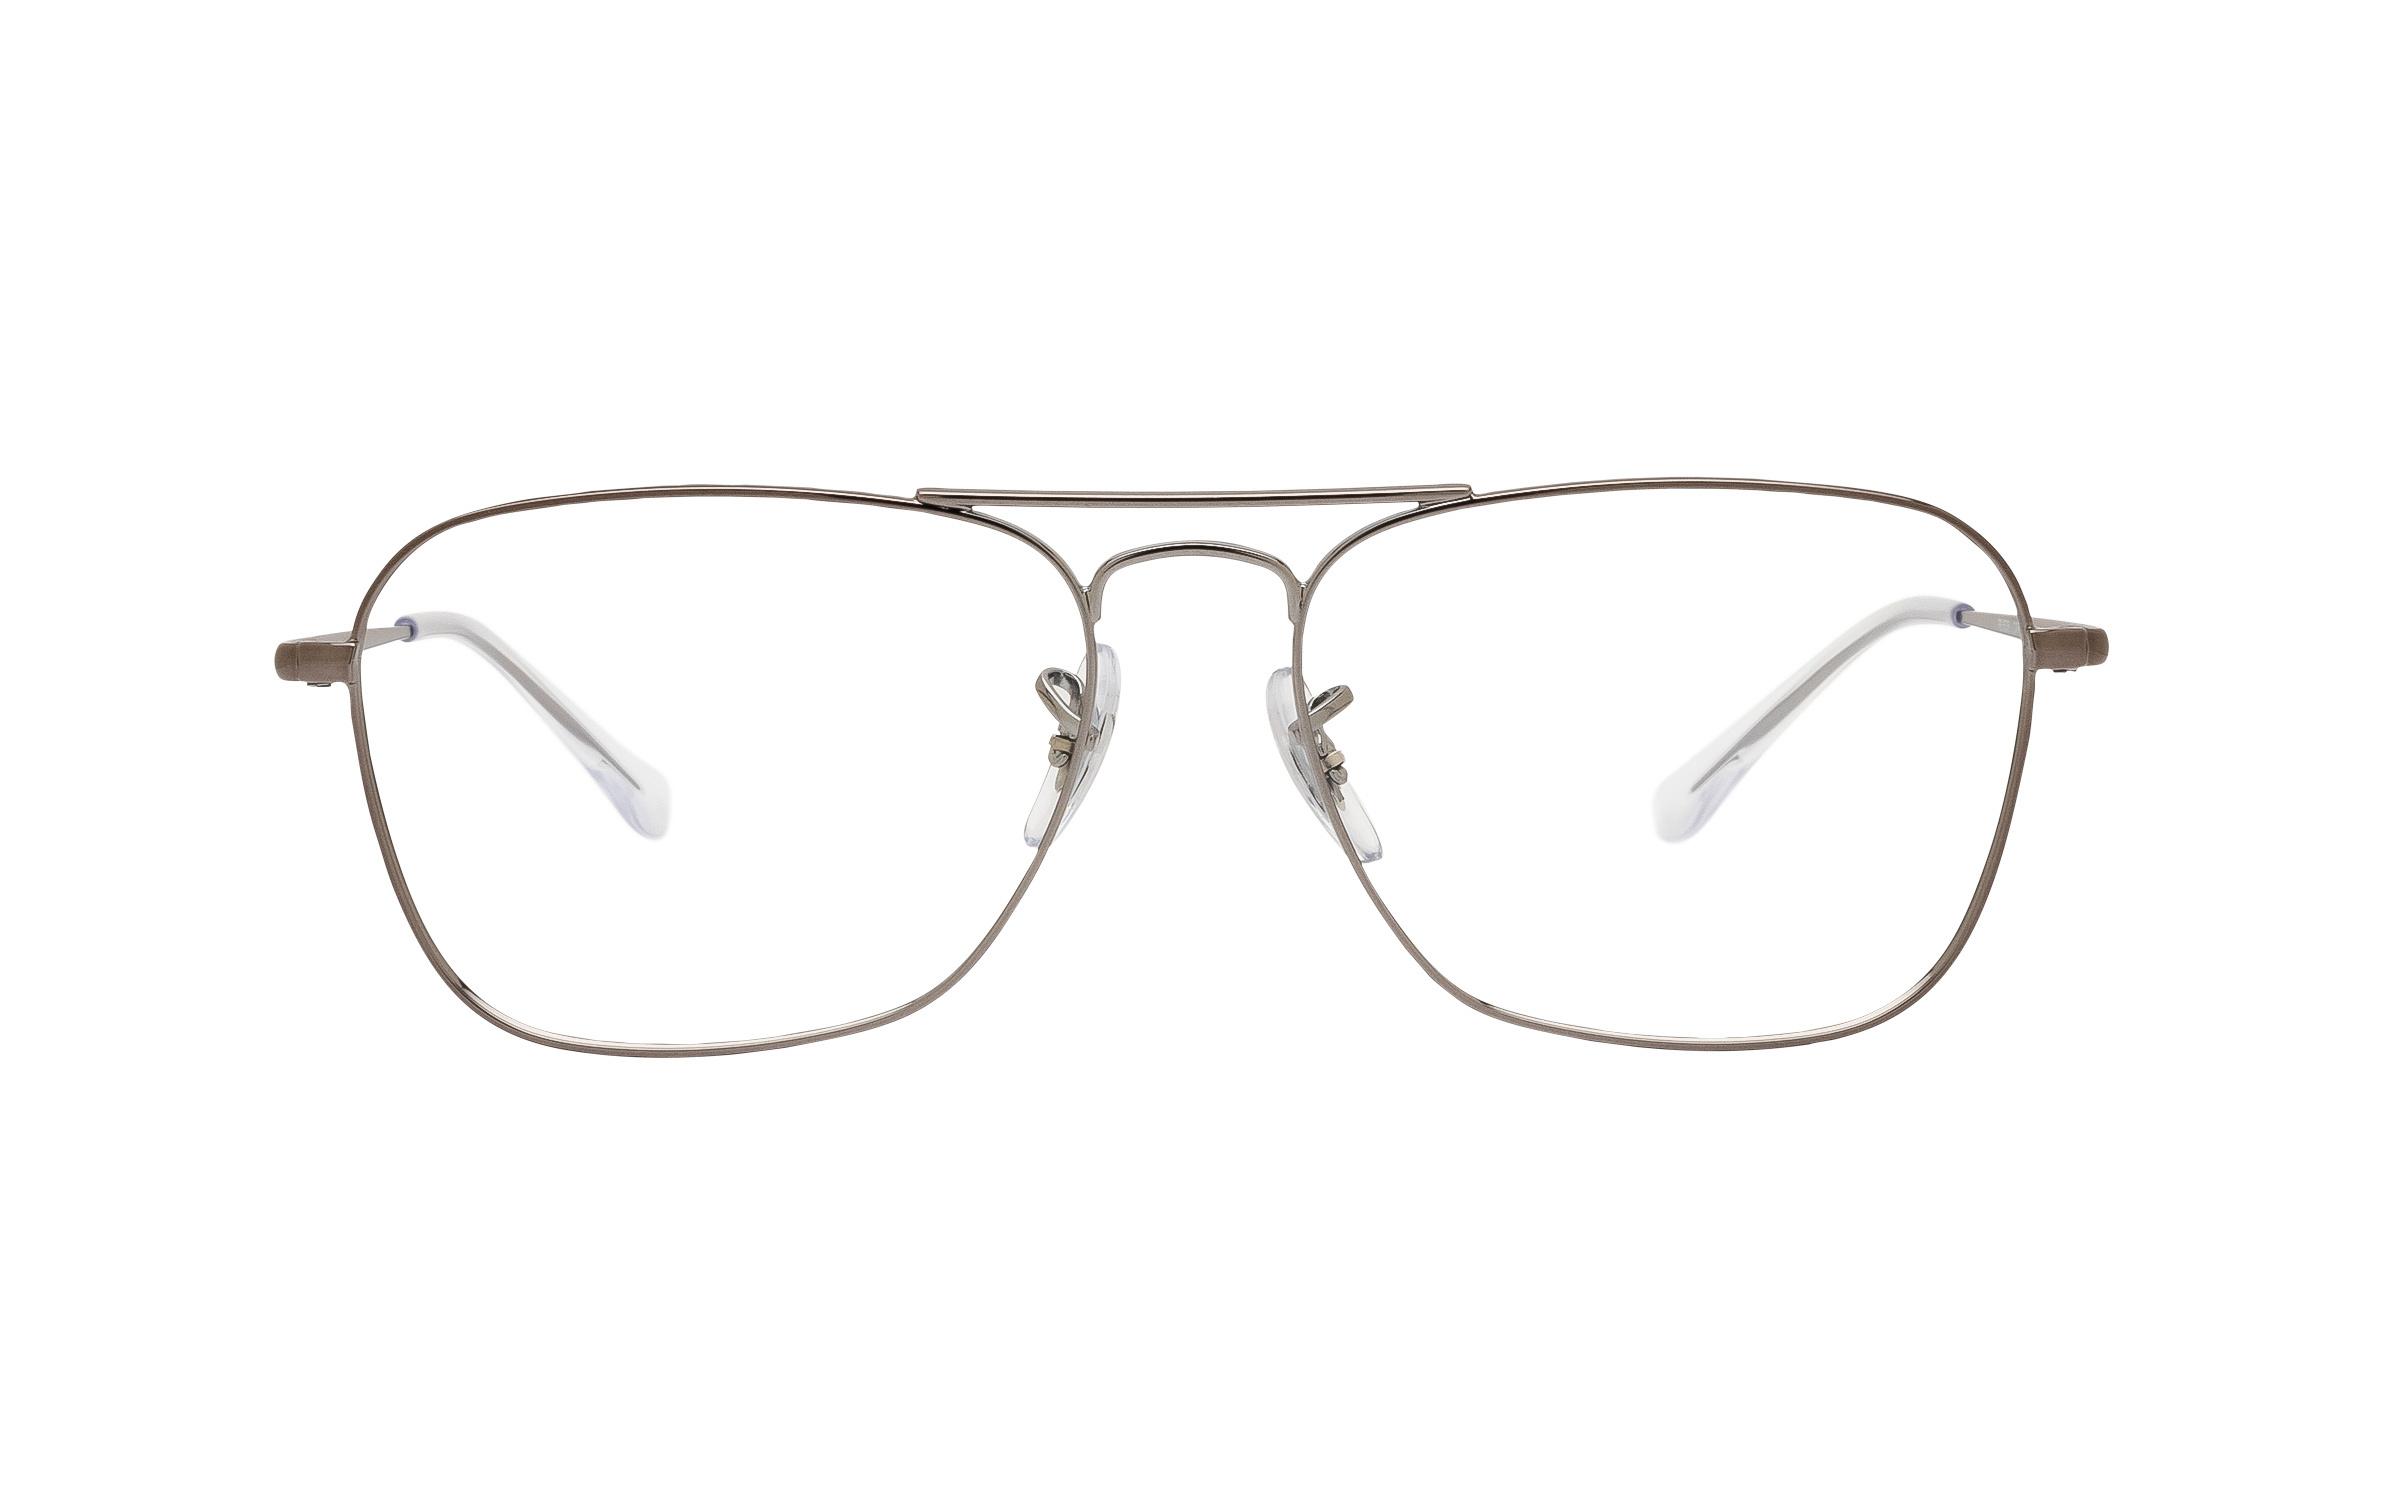 http://www.coastal.com/ - Ray-Ban Caravan II RX6536 2502 (55) Eyeglasses and Frame in Gunmetal Grey – Online Coastal